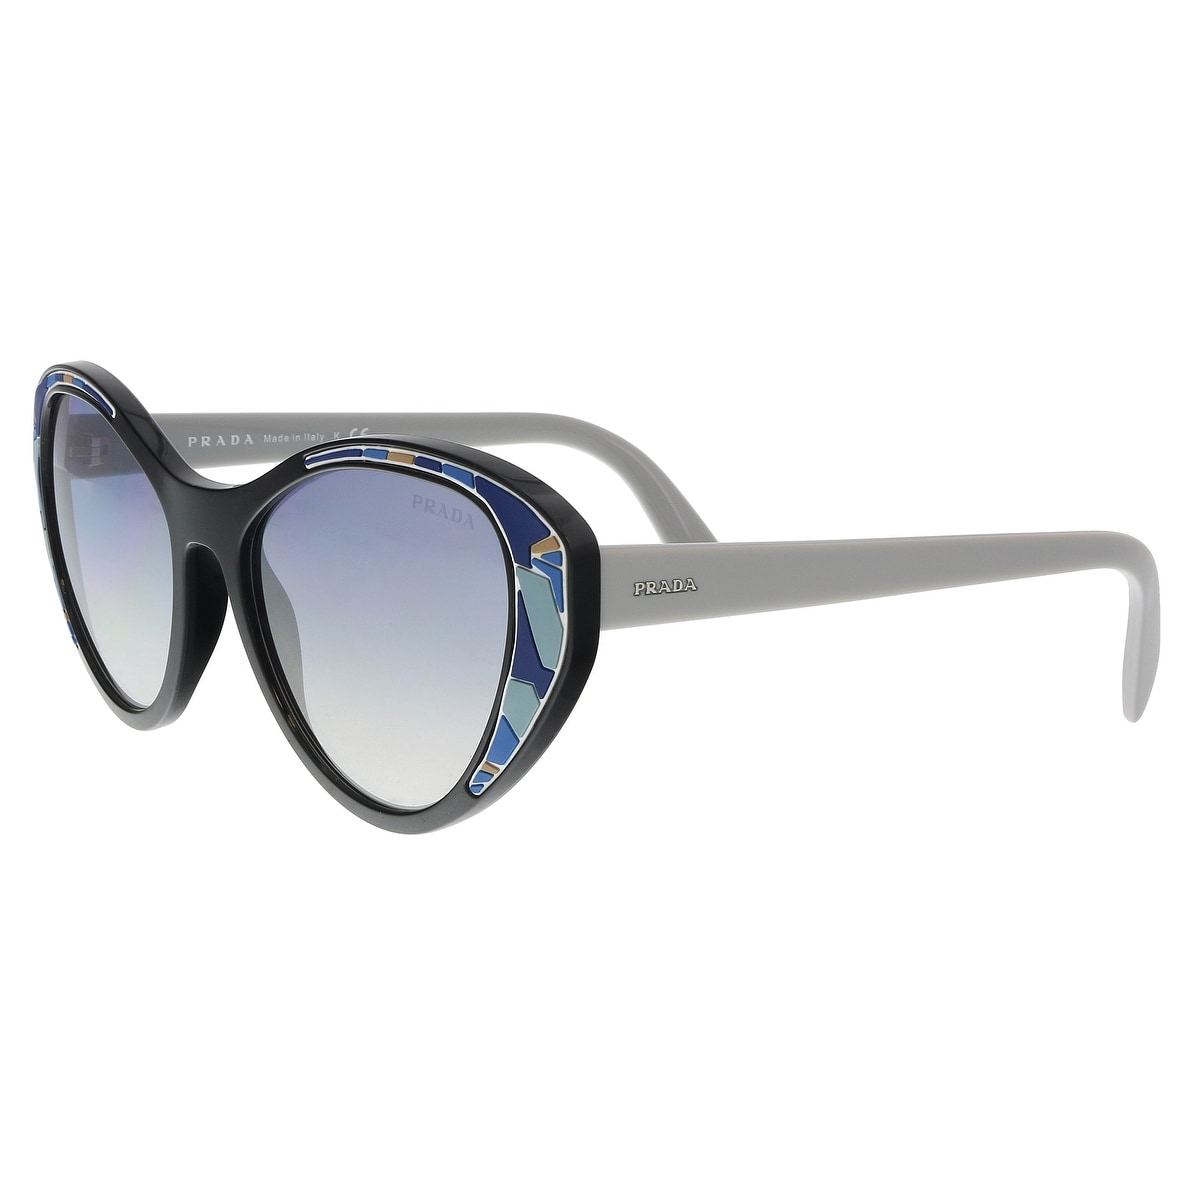 e2f2366bdeff4 Prada Sunglasses